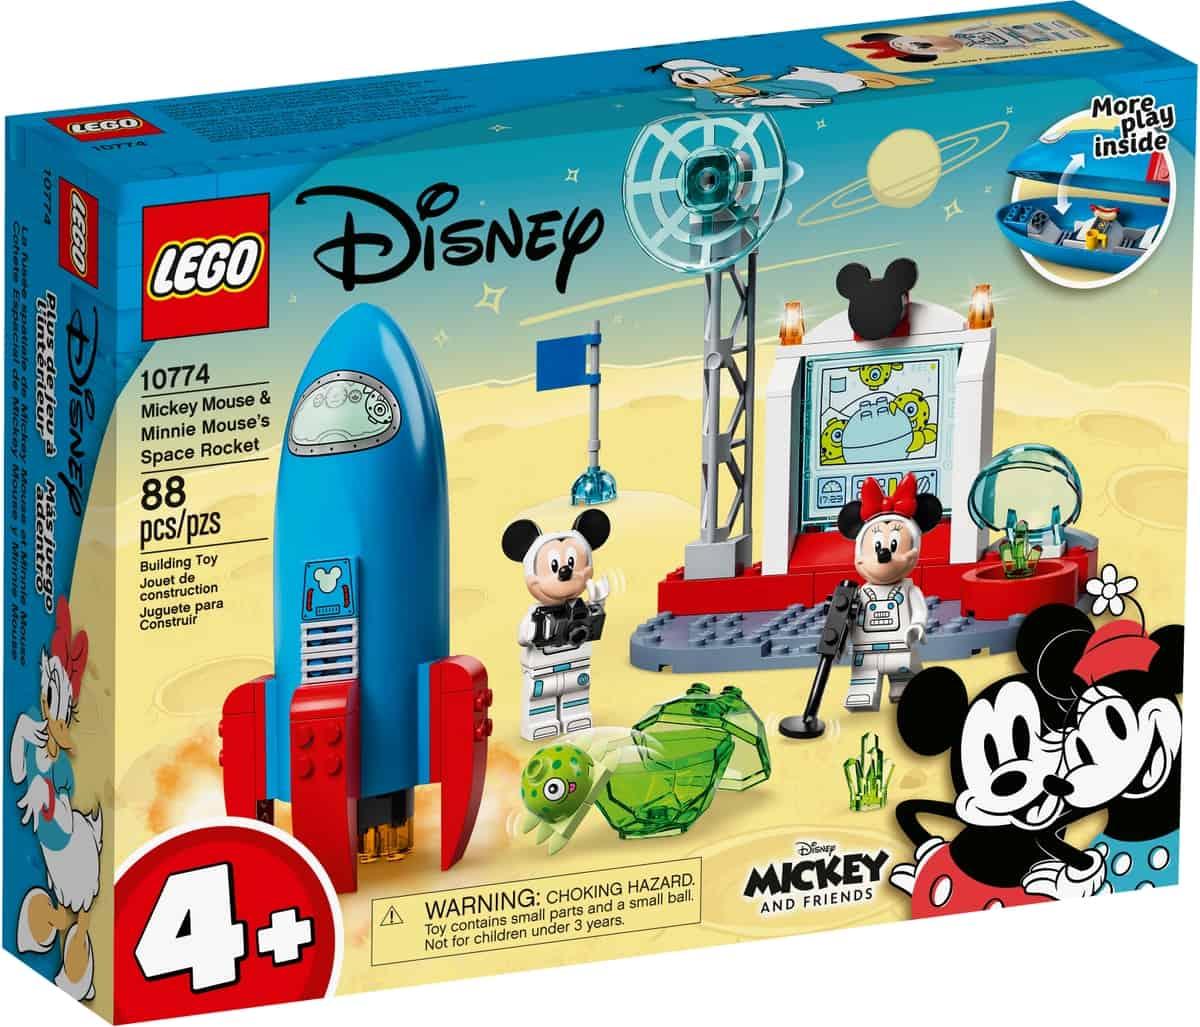 lego 10774 foguetao espacial do mickey mouse e da minnie mouse